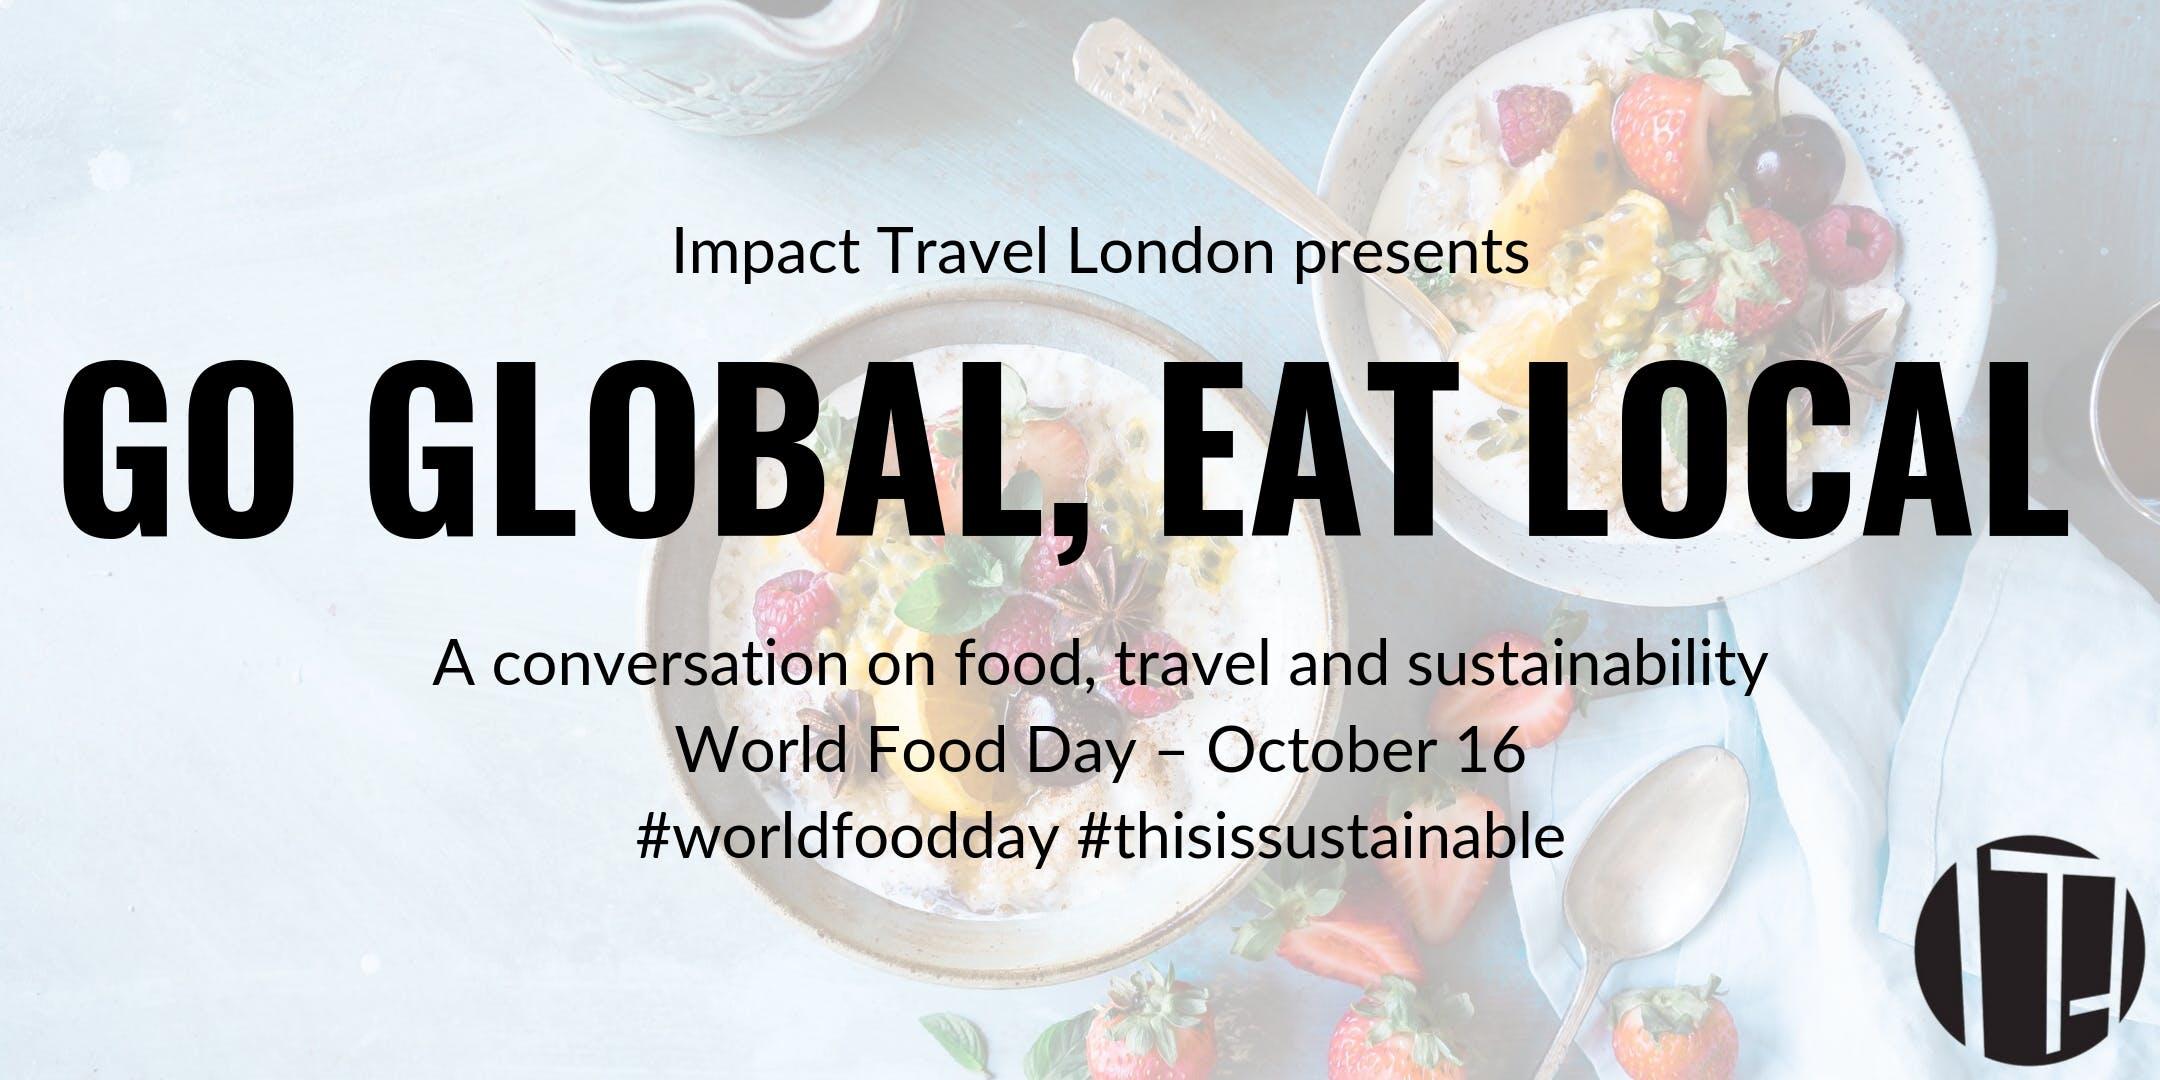 Impact Travel London Presents: World Food Day